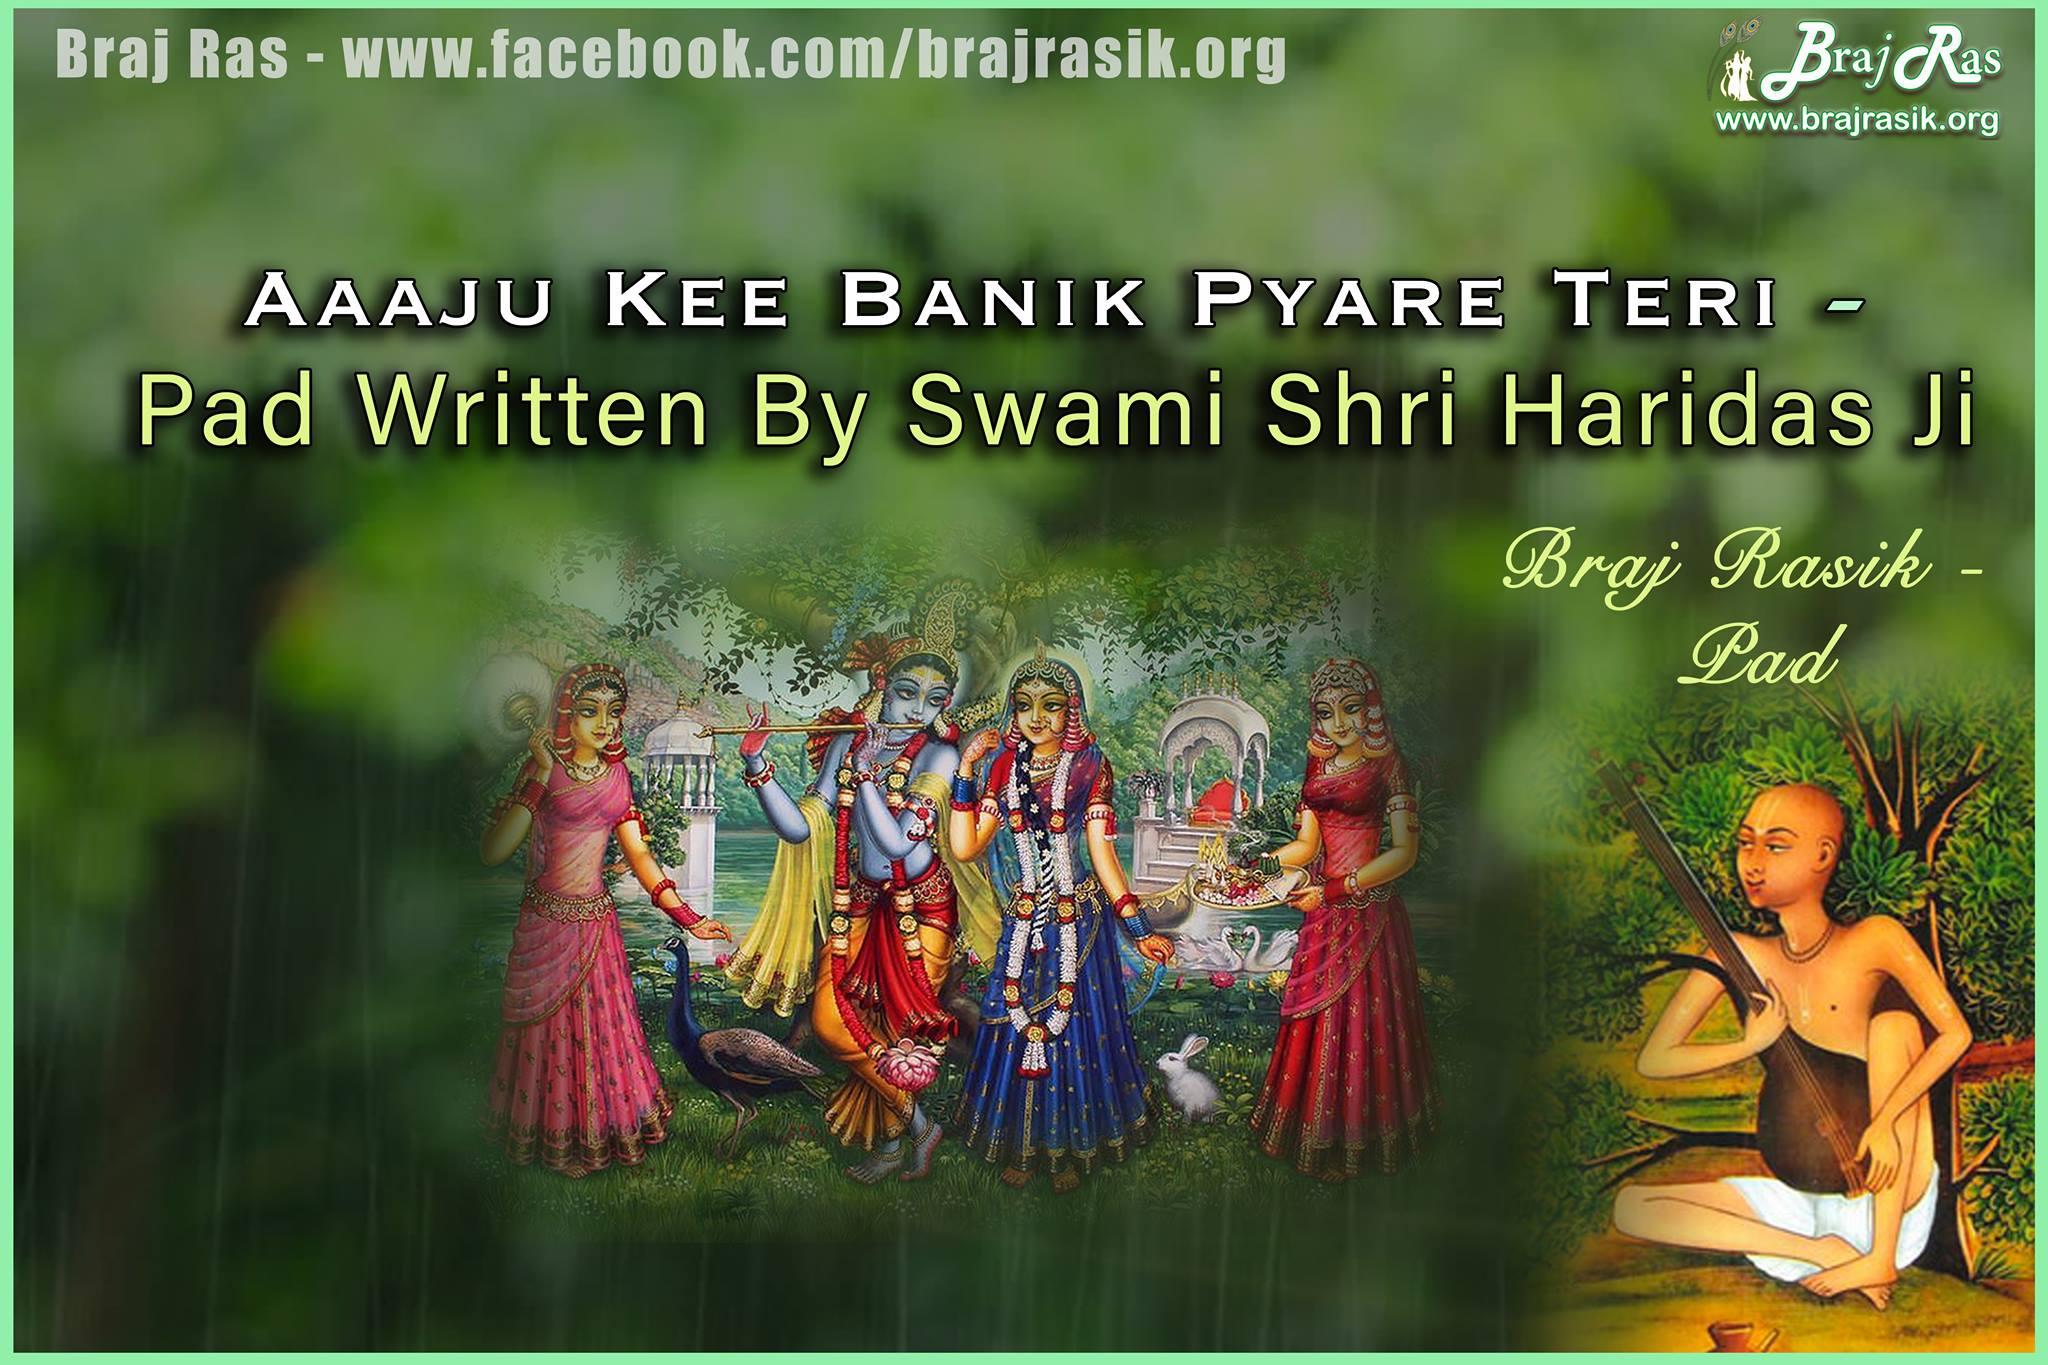 Aaaju Kee Banik Pyare Teri - Pad Written By Swami Shri Haridas Ji